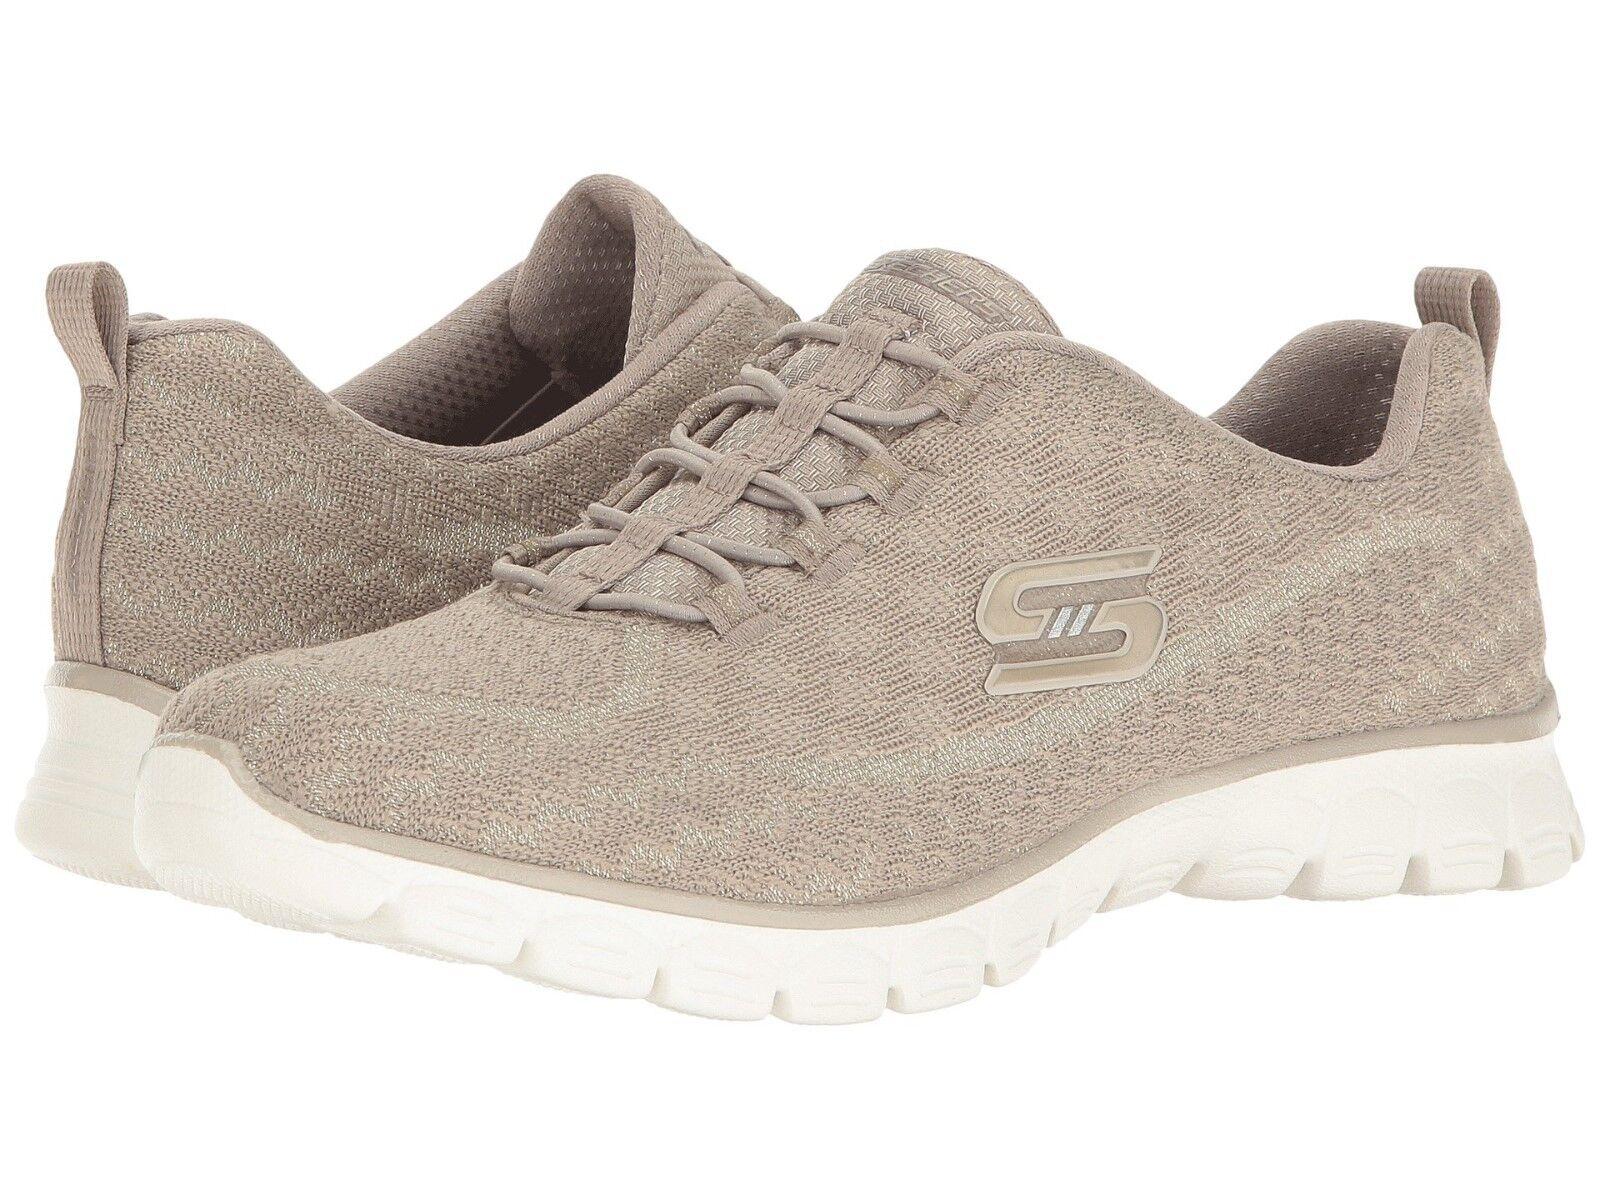 Skechers EZ 3.0 Flex 3.0 EZ Estrella Damens Schuhes Air Cooled Slip on Walking Sneakers 10 448dab